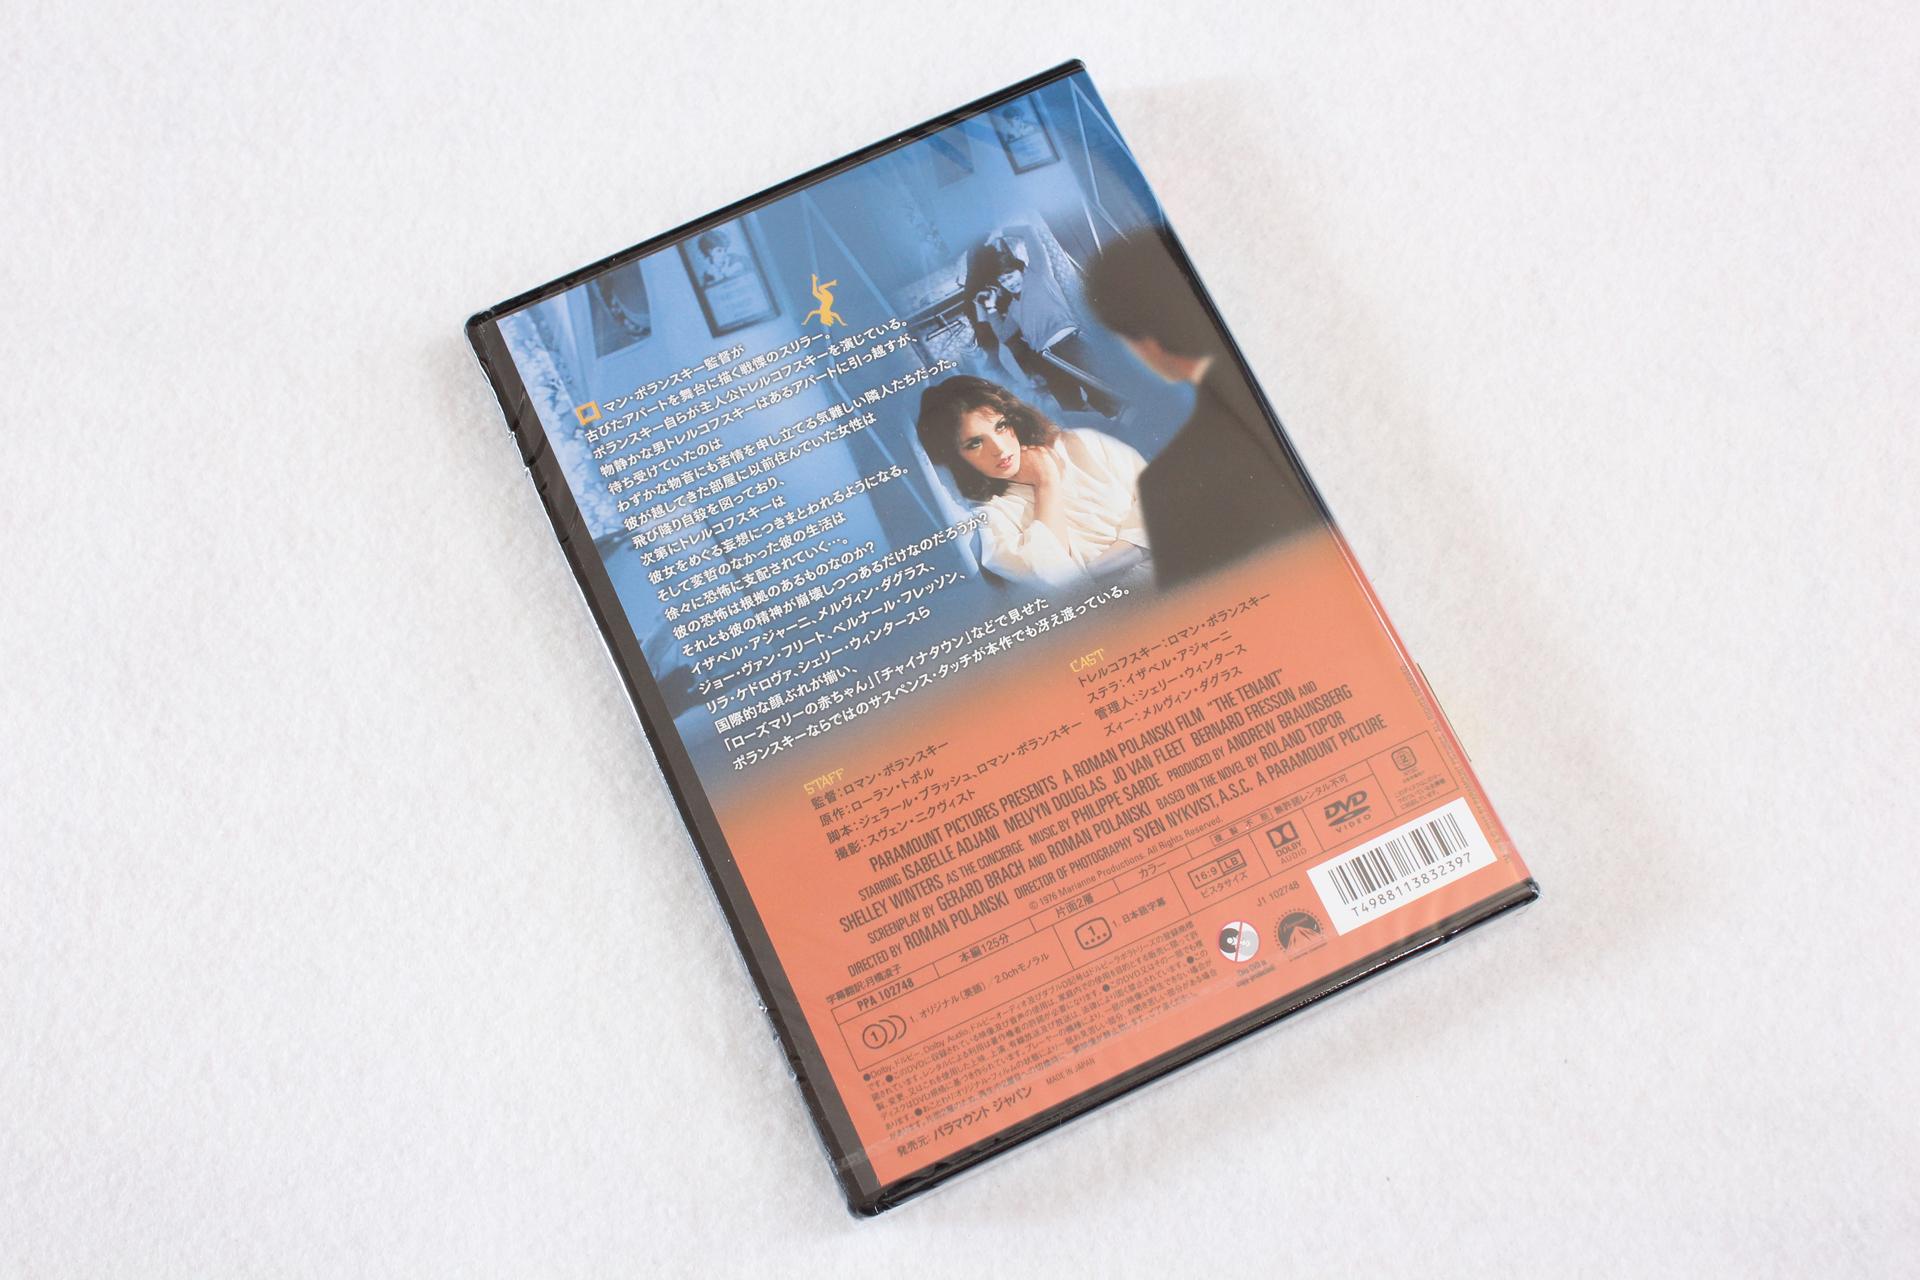 2015-05-13-DVD_TENANT-2.JPG